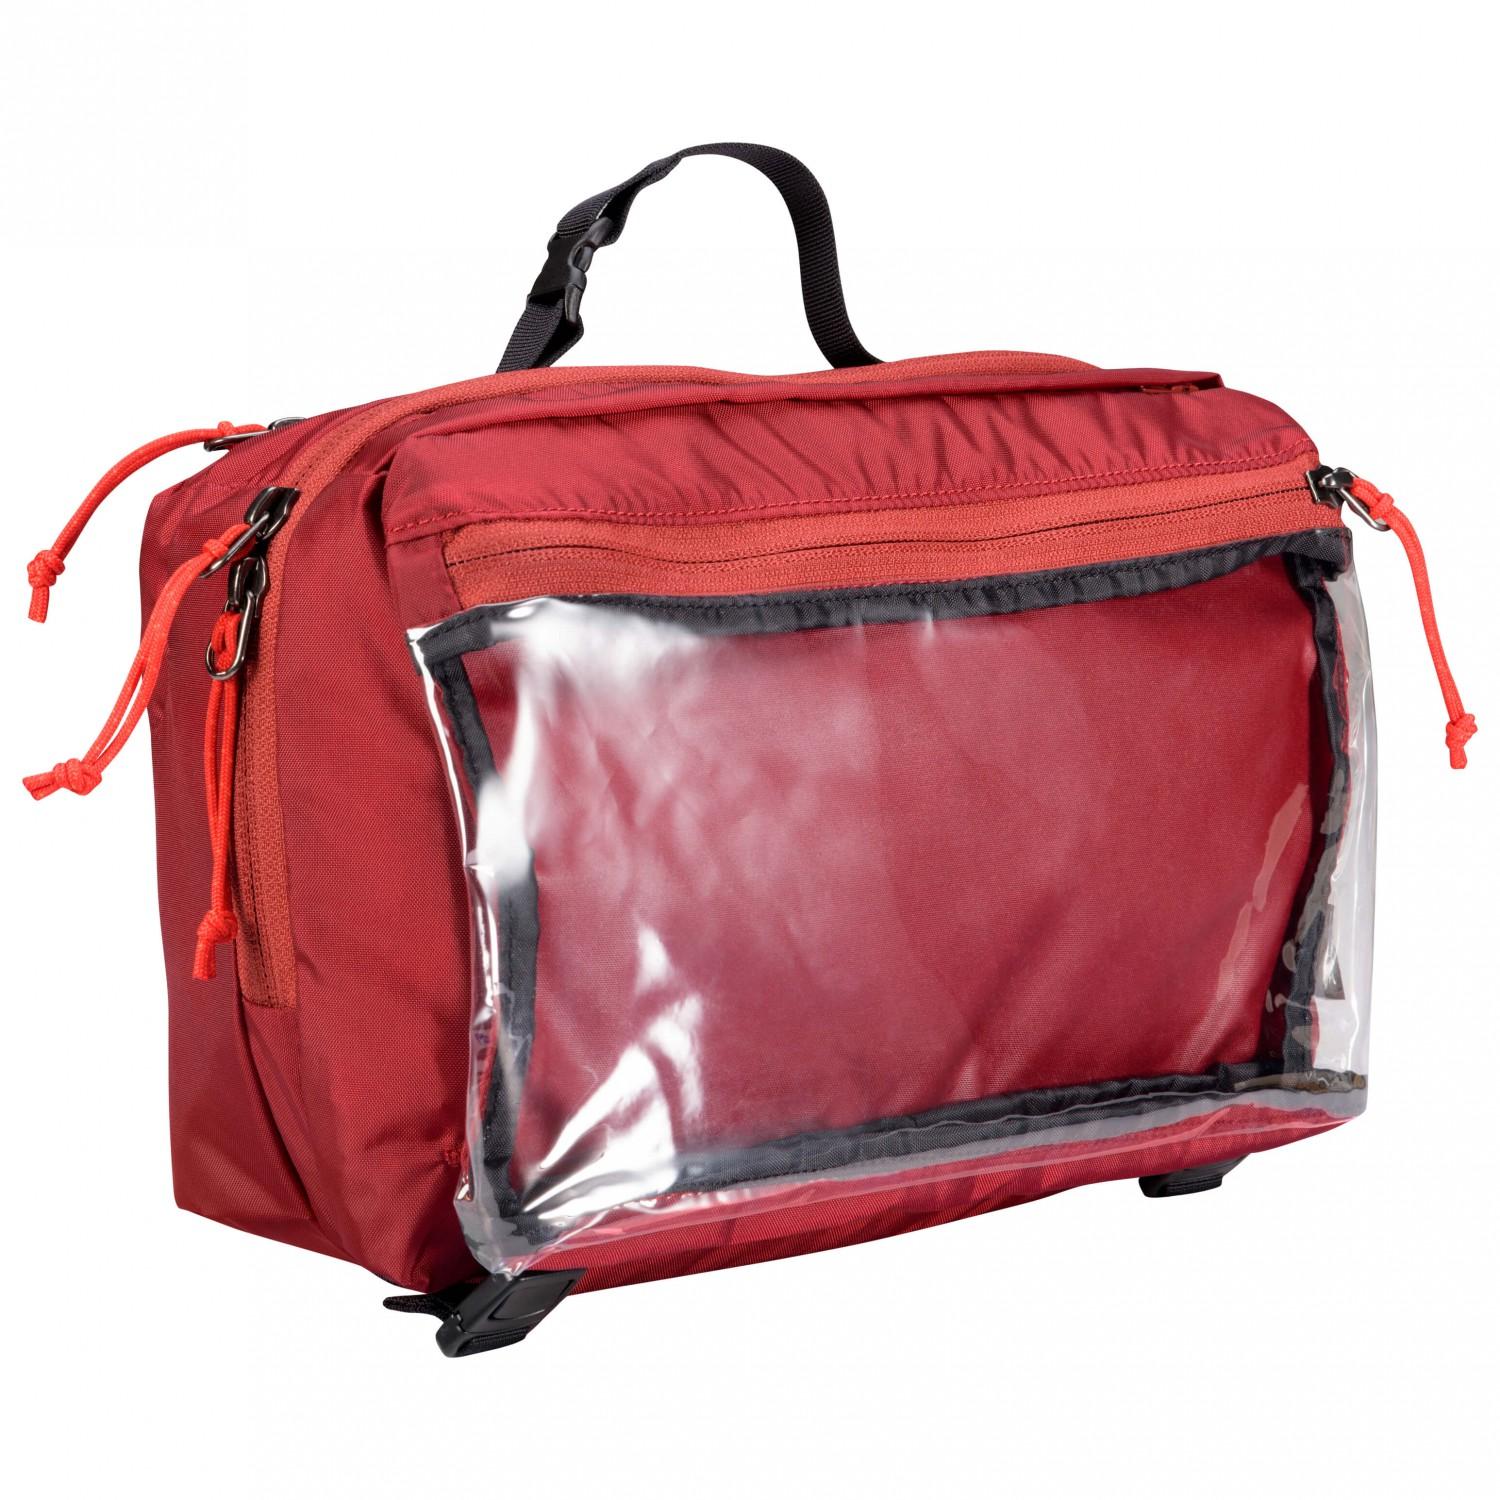 62bac124376 Arc'teryx Index Large Toiletries Bag - Wash Bag | Buy online ...